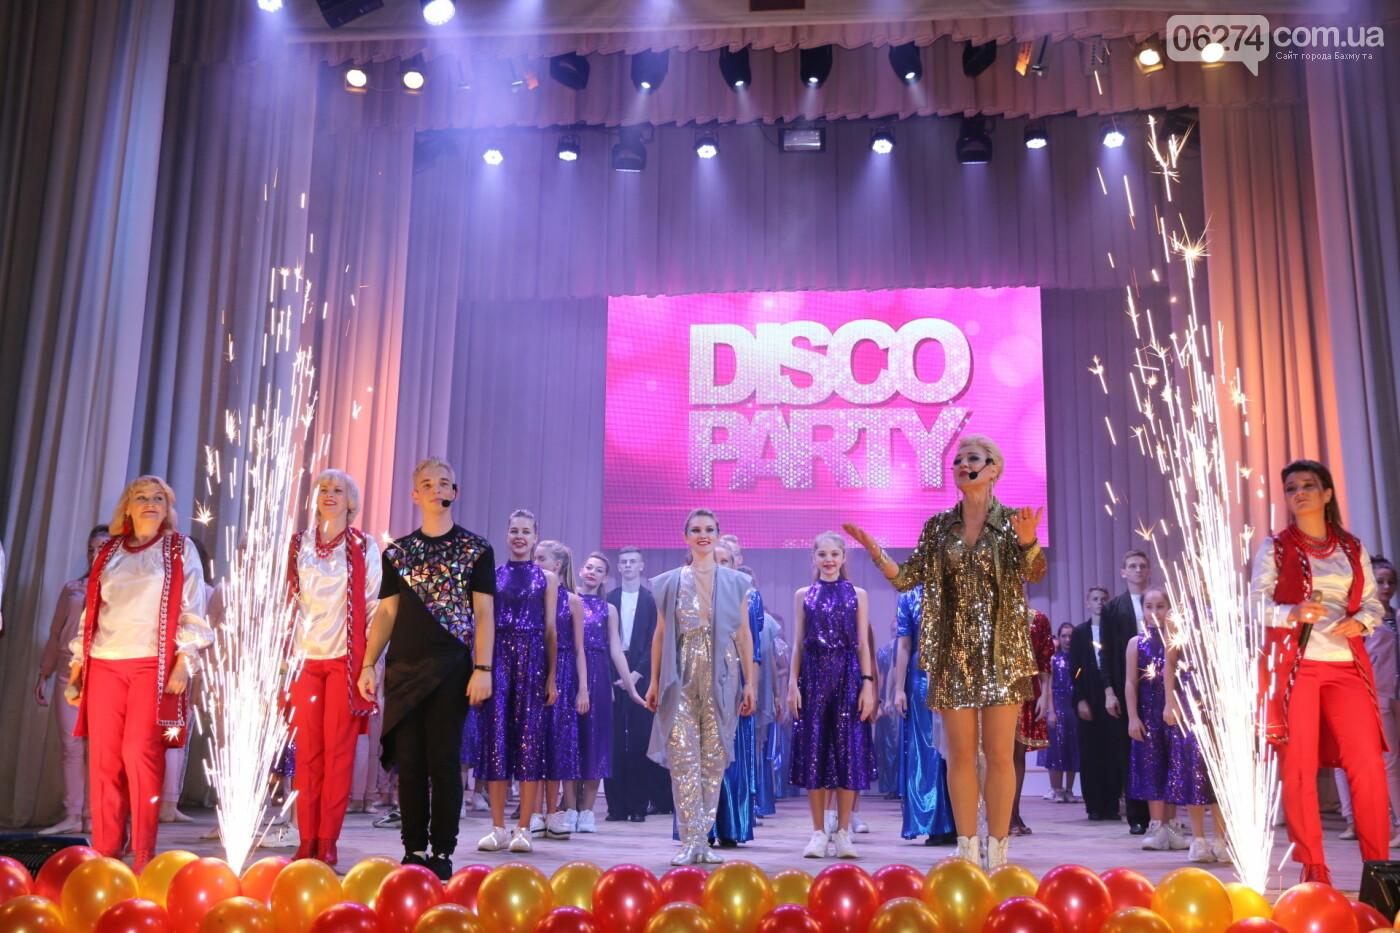 В Бахмуте провели Disco House Party (ФОТООТЧЕТ), фото-13